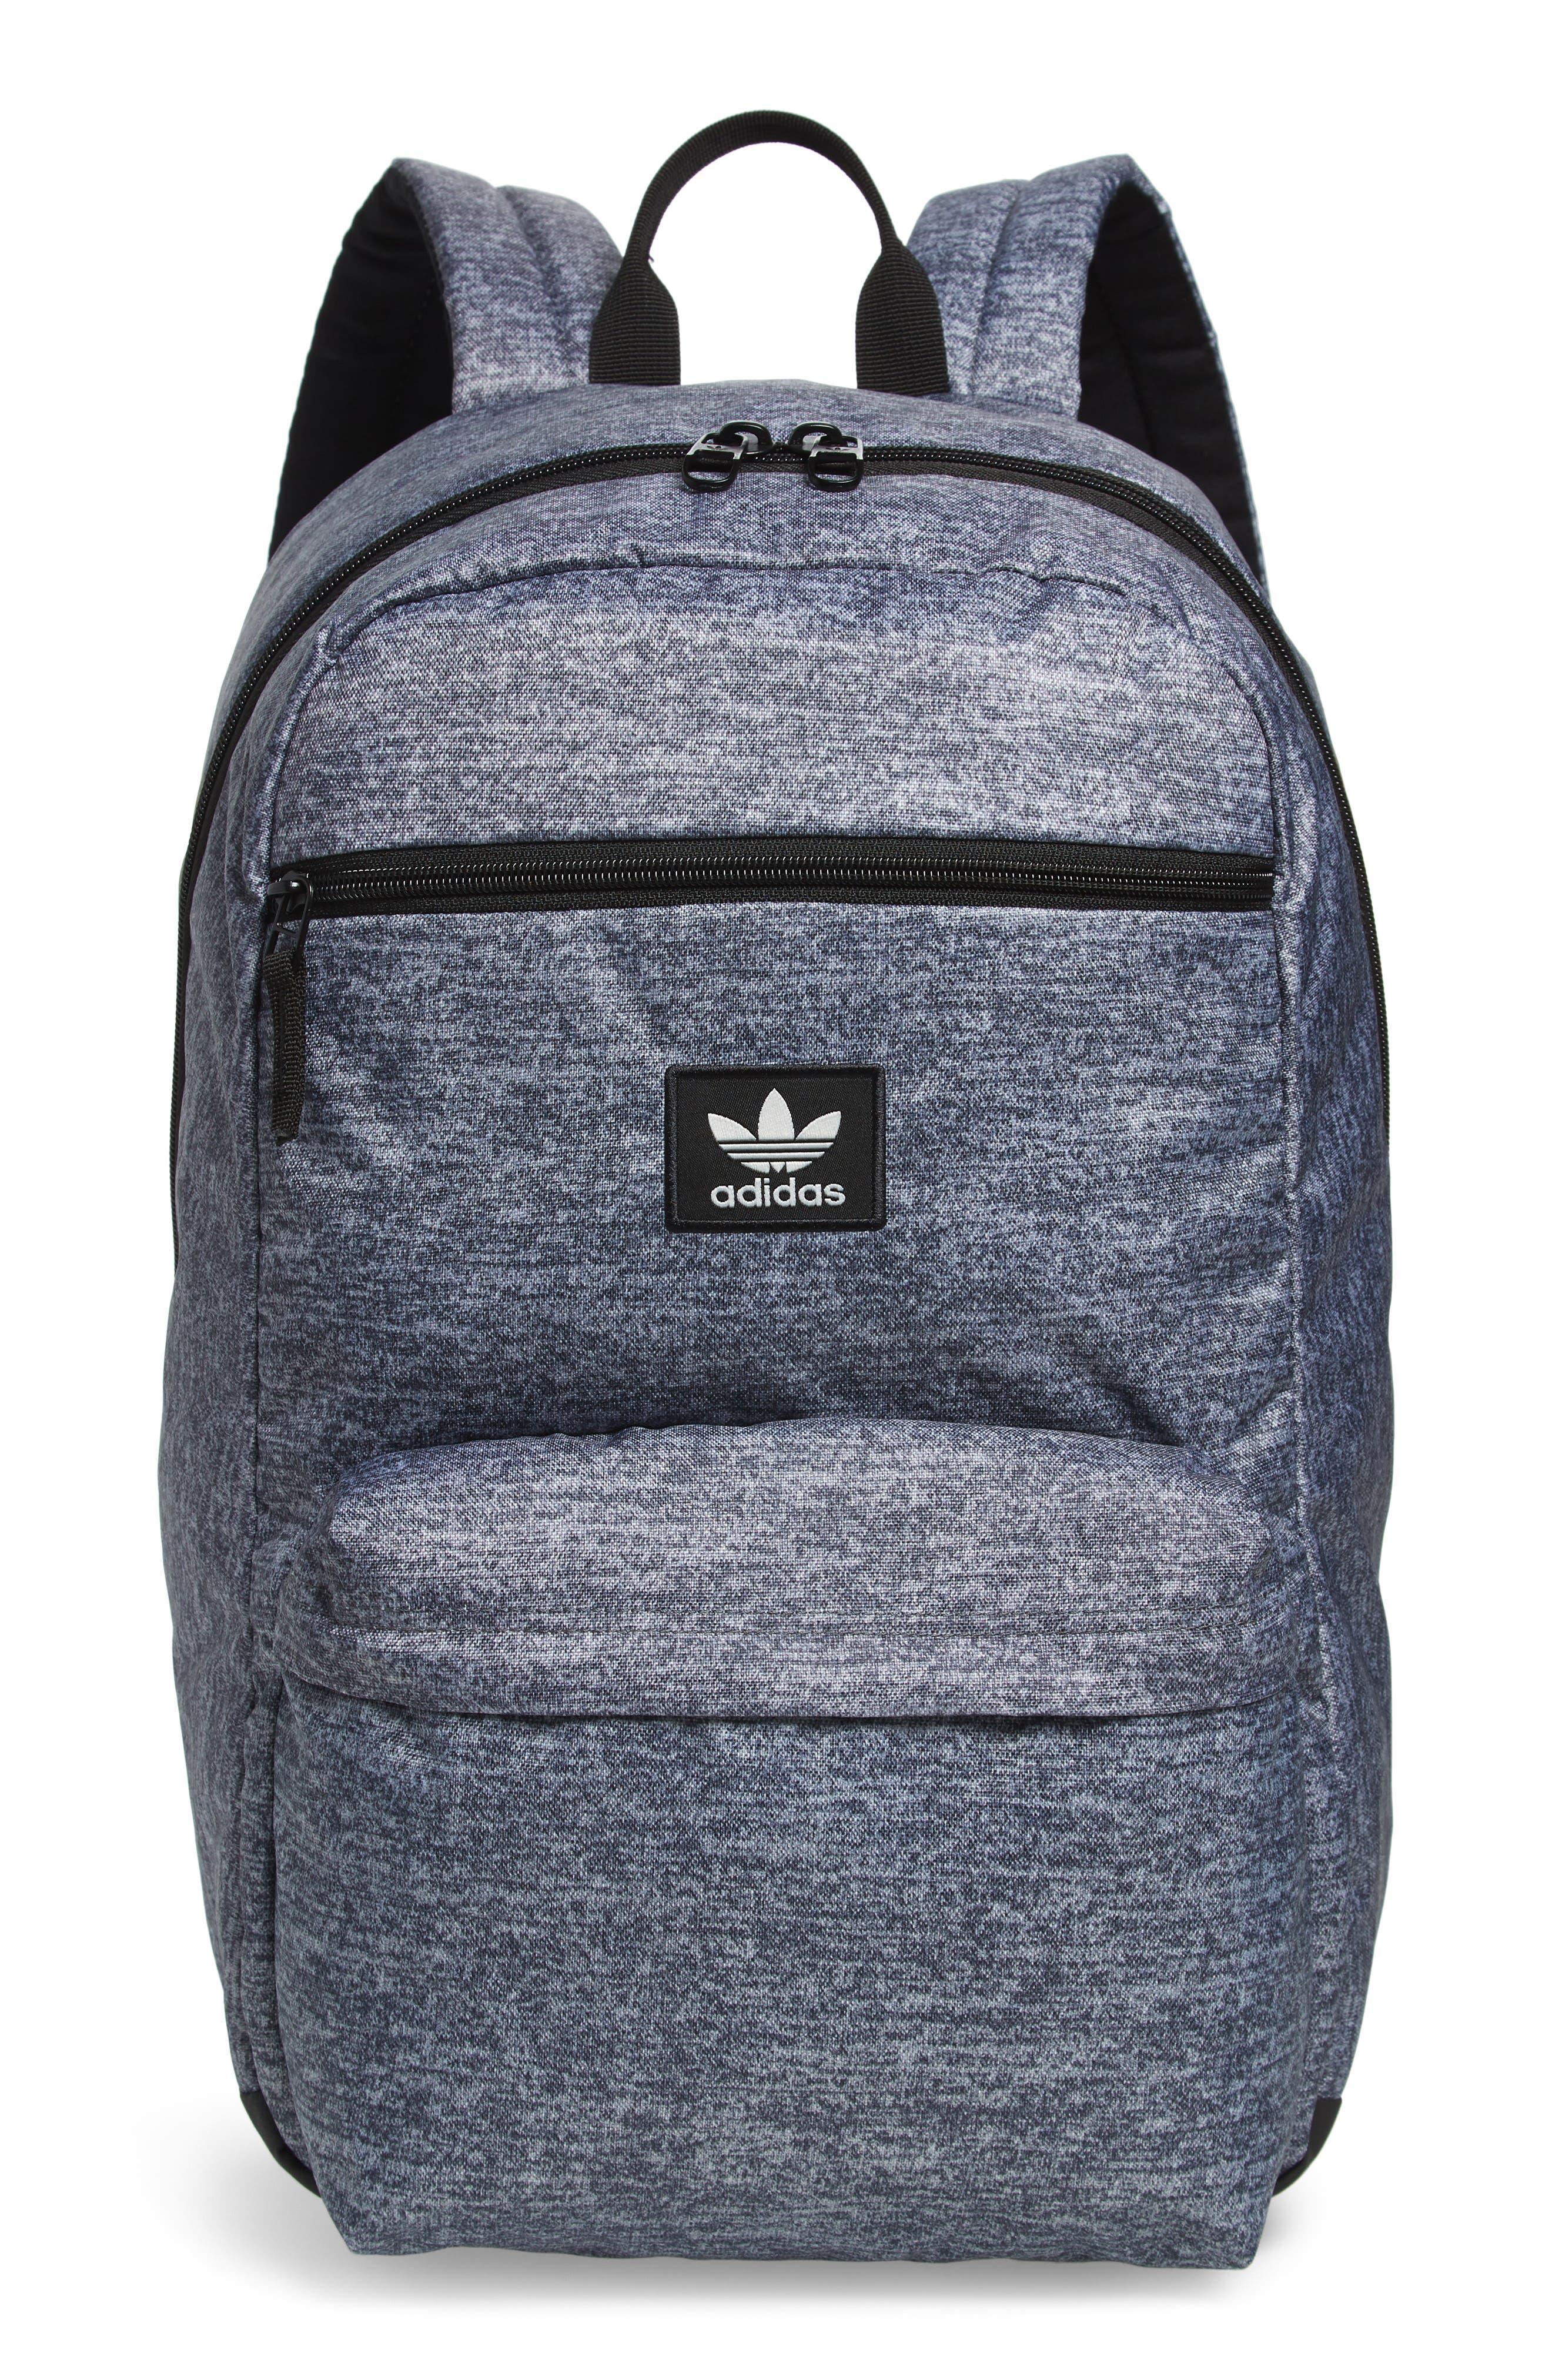 adidas Original National Backpack,                             Main thumbnail 1, color,                             ONYX JERSEY/ BLACK